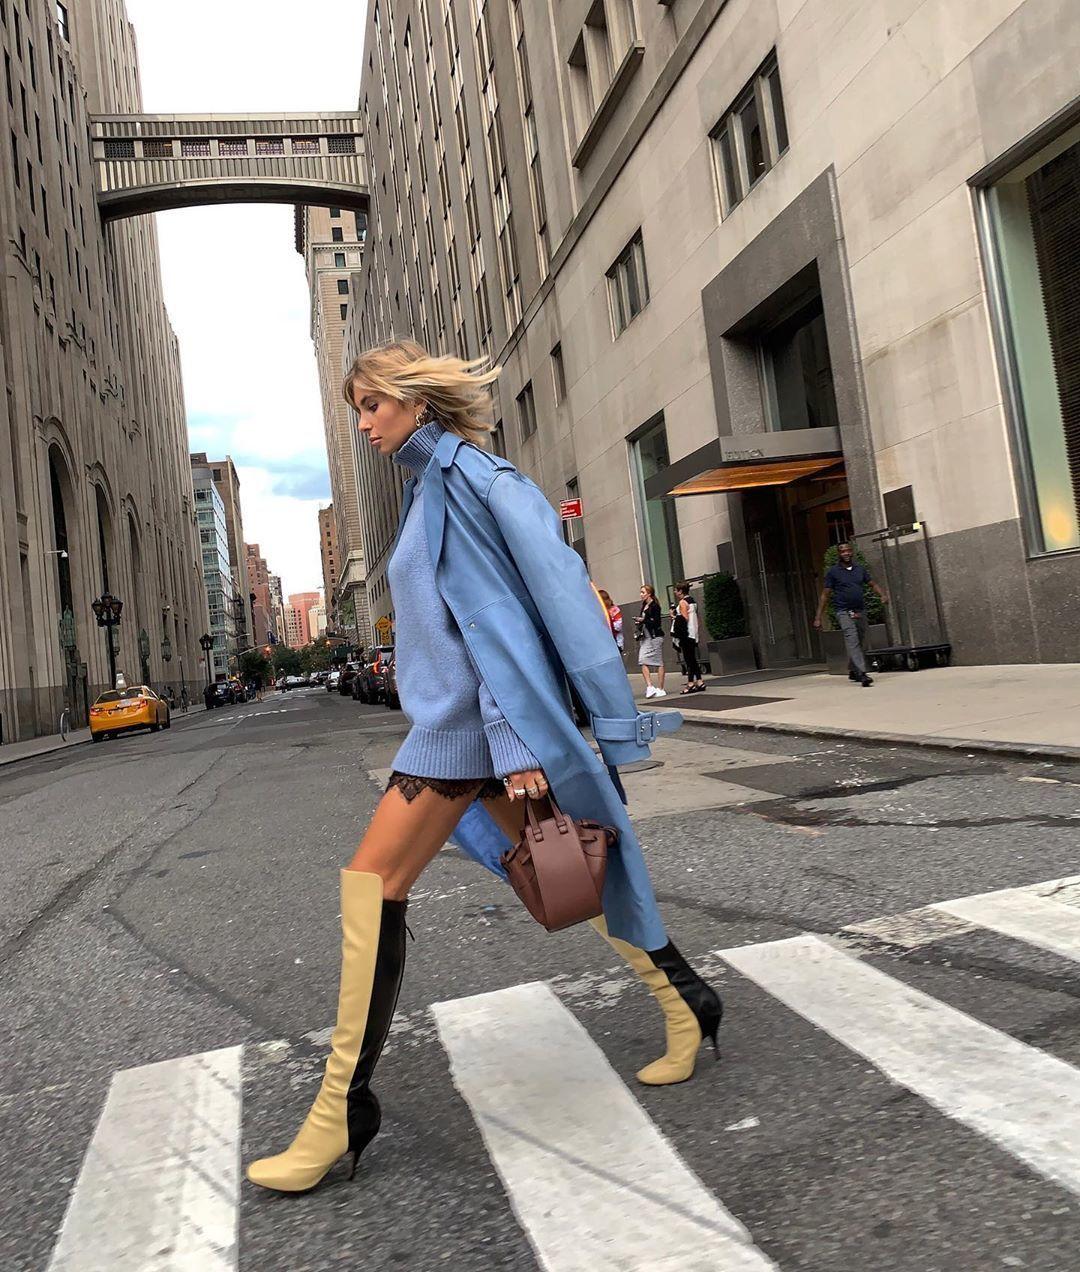 Ikuti Tren Terbaru dengan Outfit Two-tone yang Kekinian